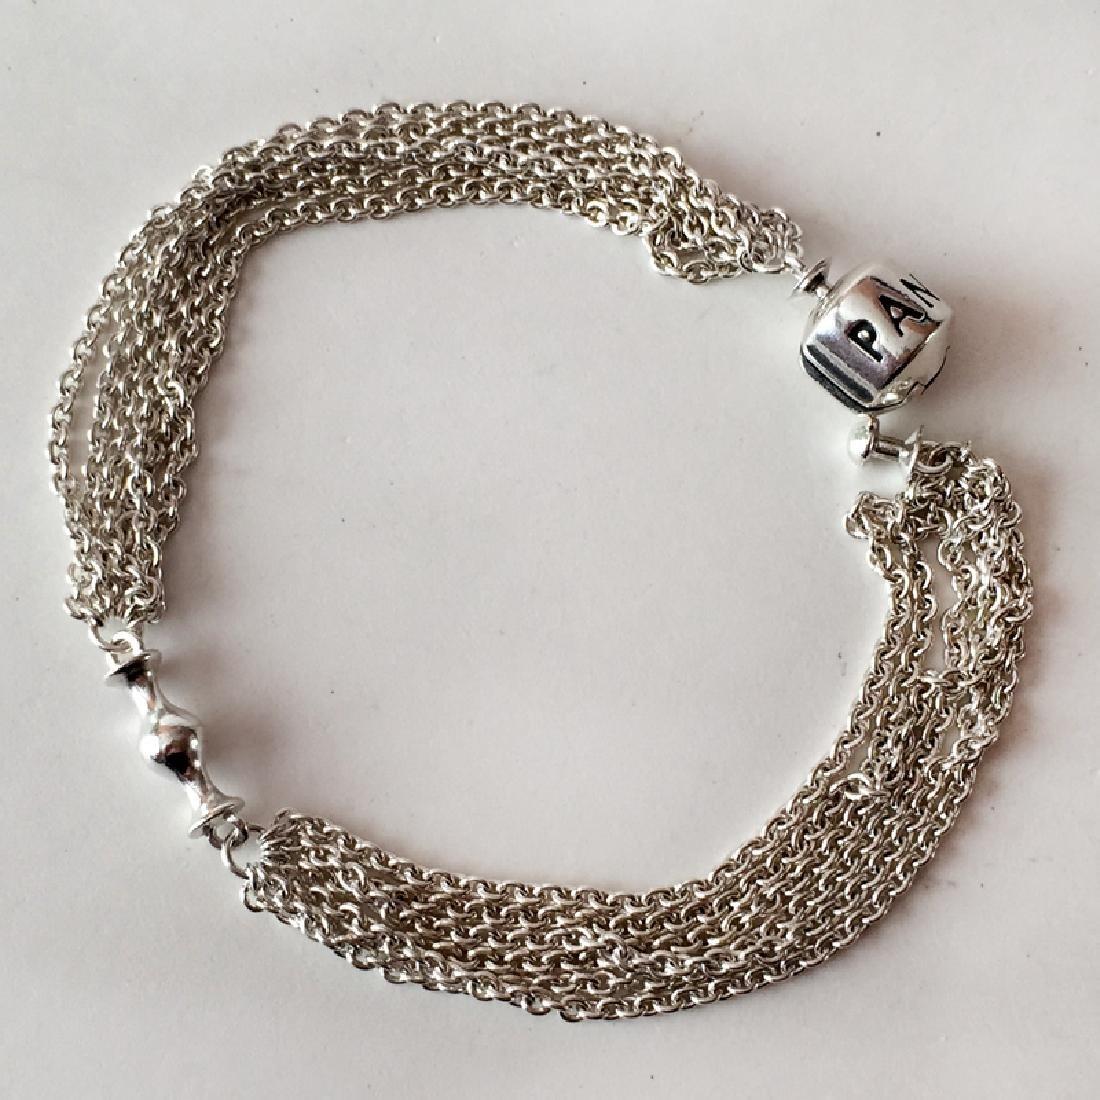 PANDORA: Sterling silver 6 strands Rollo chain bracelet